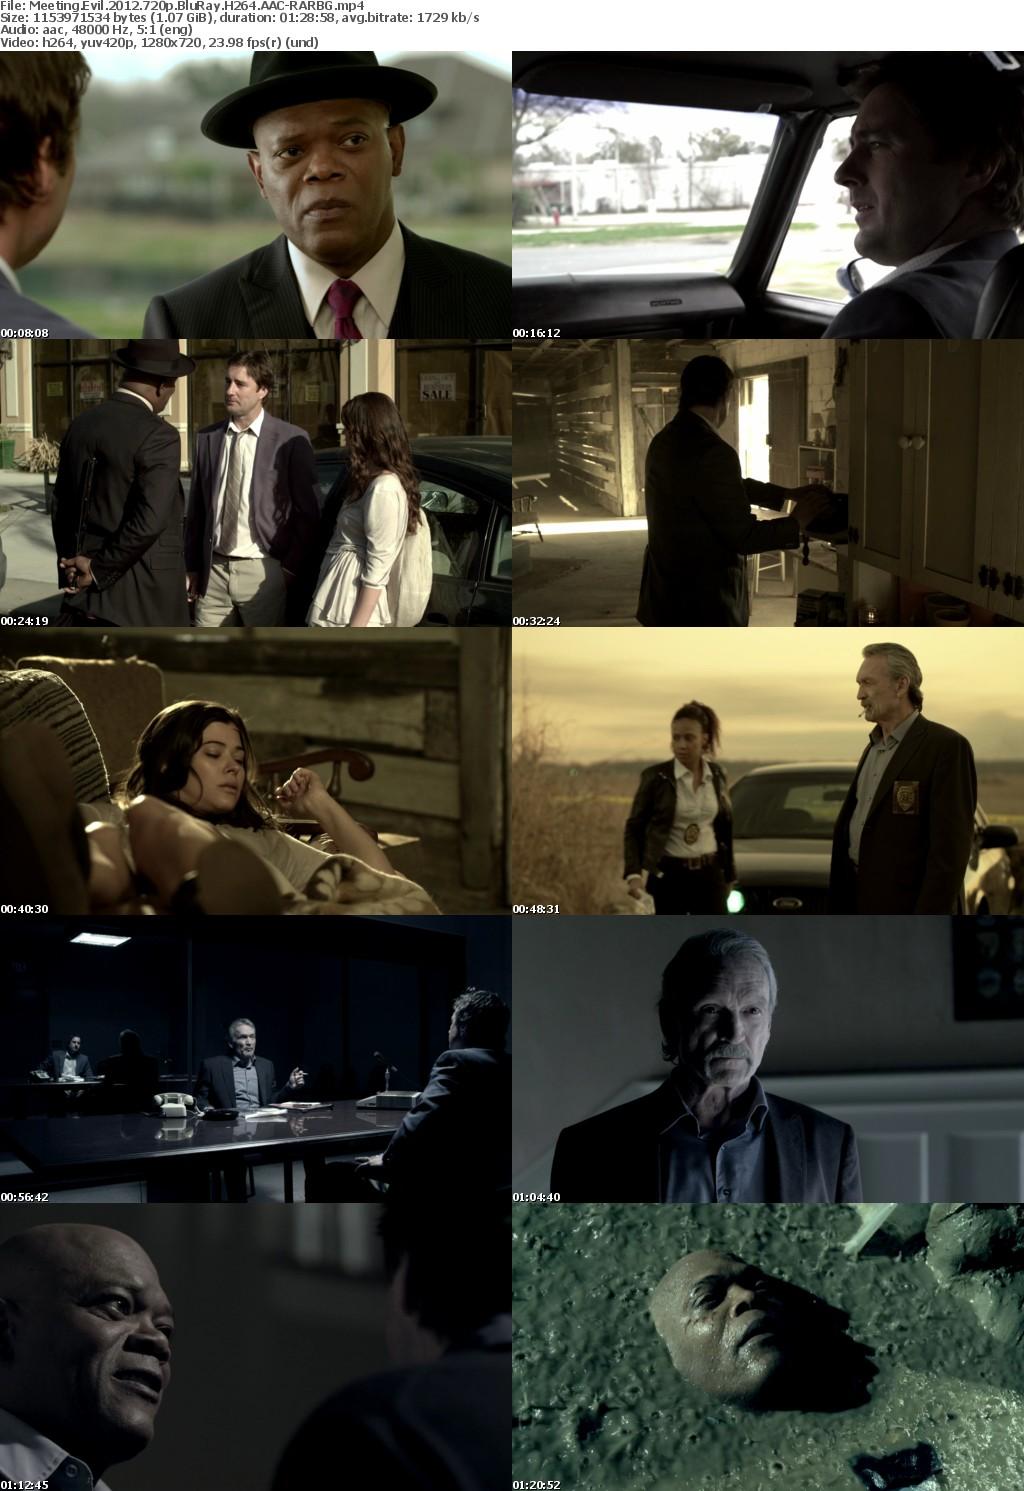 Meeting Evil 2012 720p BluRay H264 AAC-RARBG